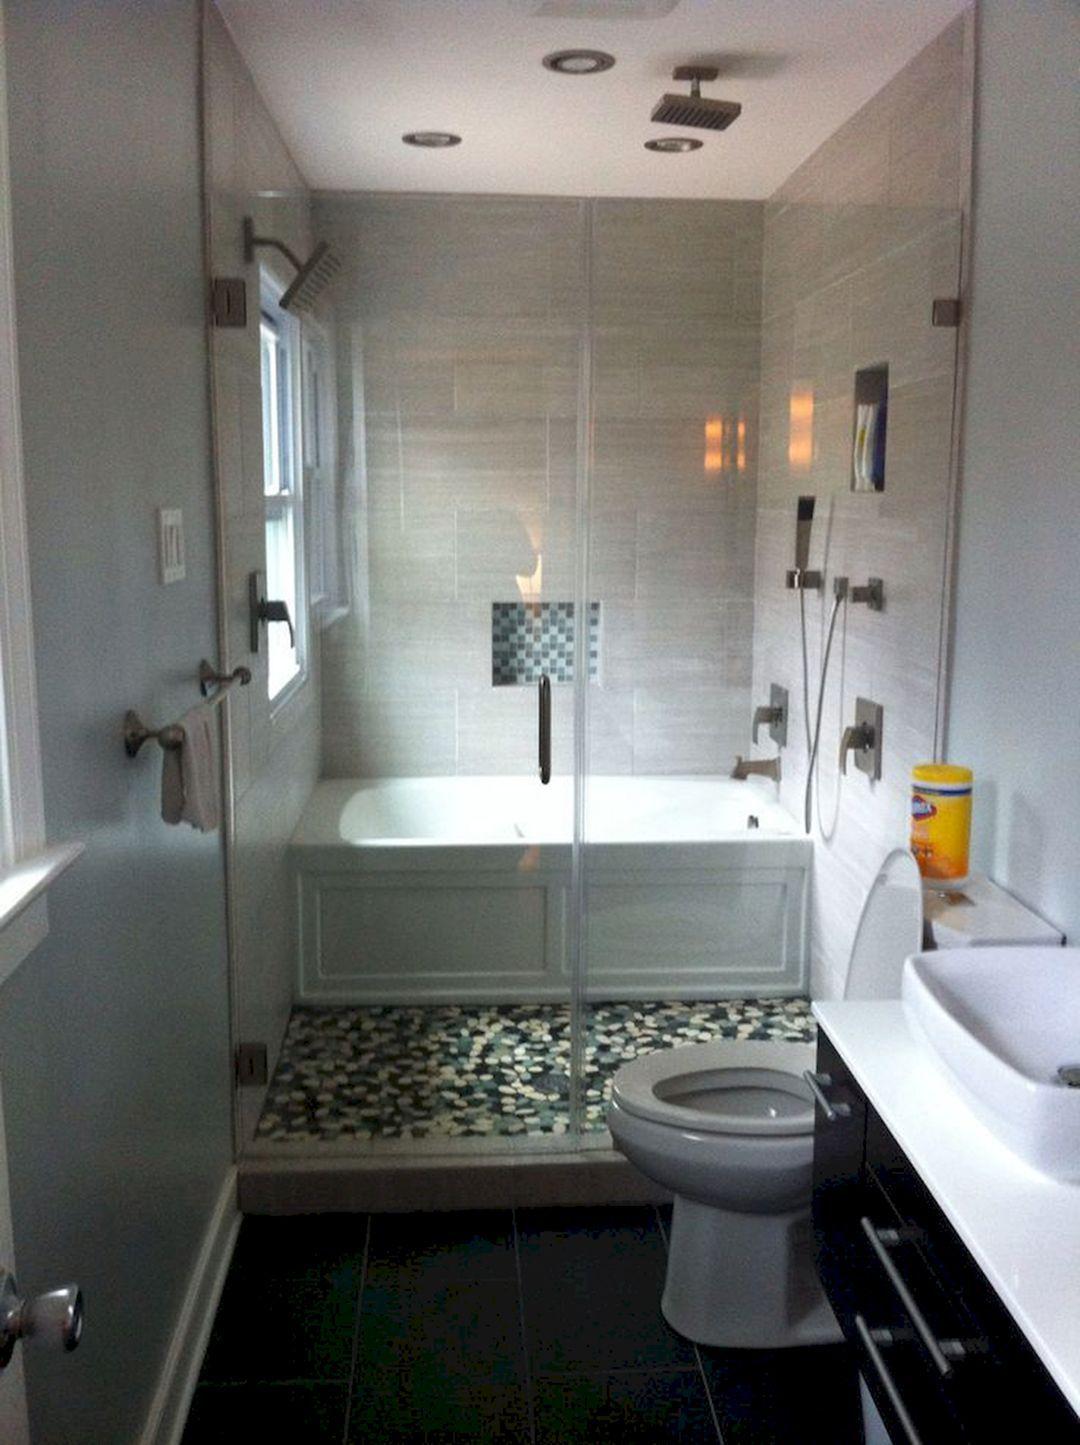 Gorgeous 43 Long Narrow Bathroom Design Ideas You Never Seen Before Narrow Bathroom Designs Small Bathroom Layout Bathroom Tub Shower Combo